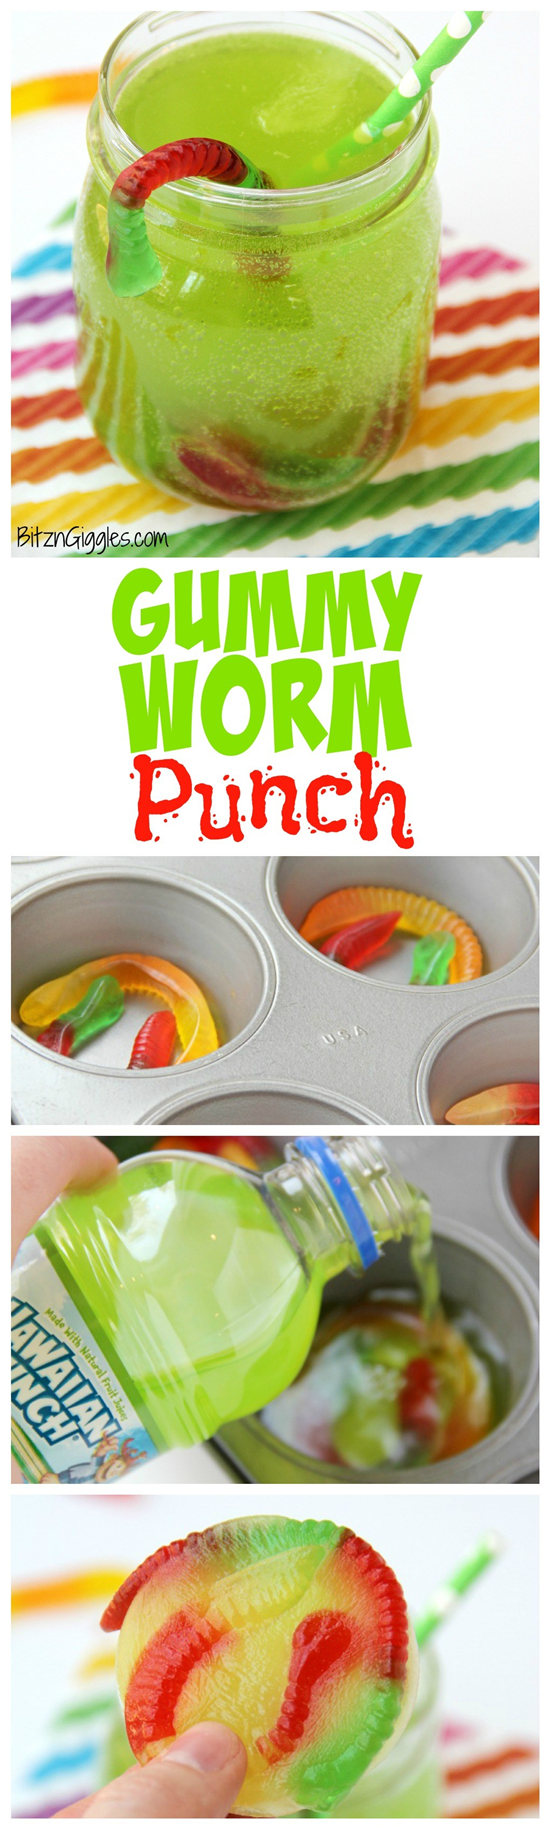 Gummy Worm Punch